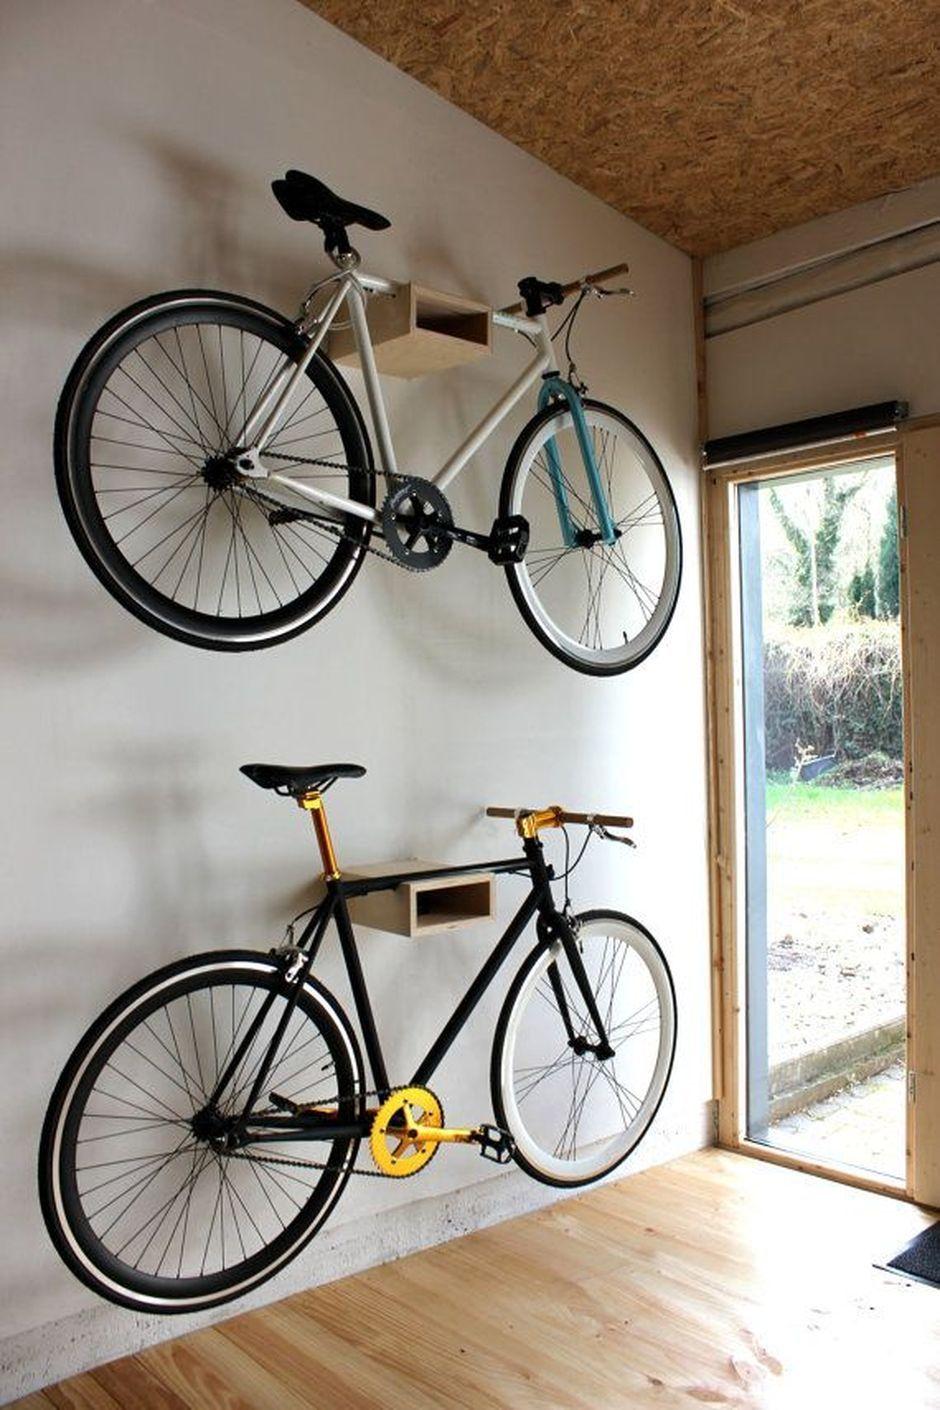 90 Brilliant Ideas To Make Hanging Bike Storage 63 Bike Storage